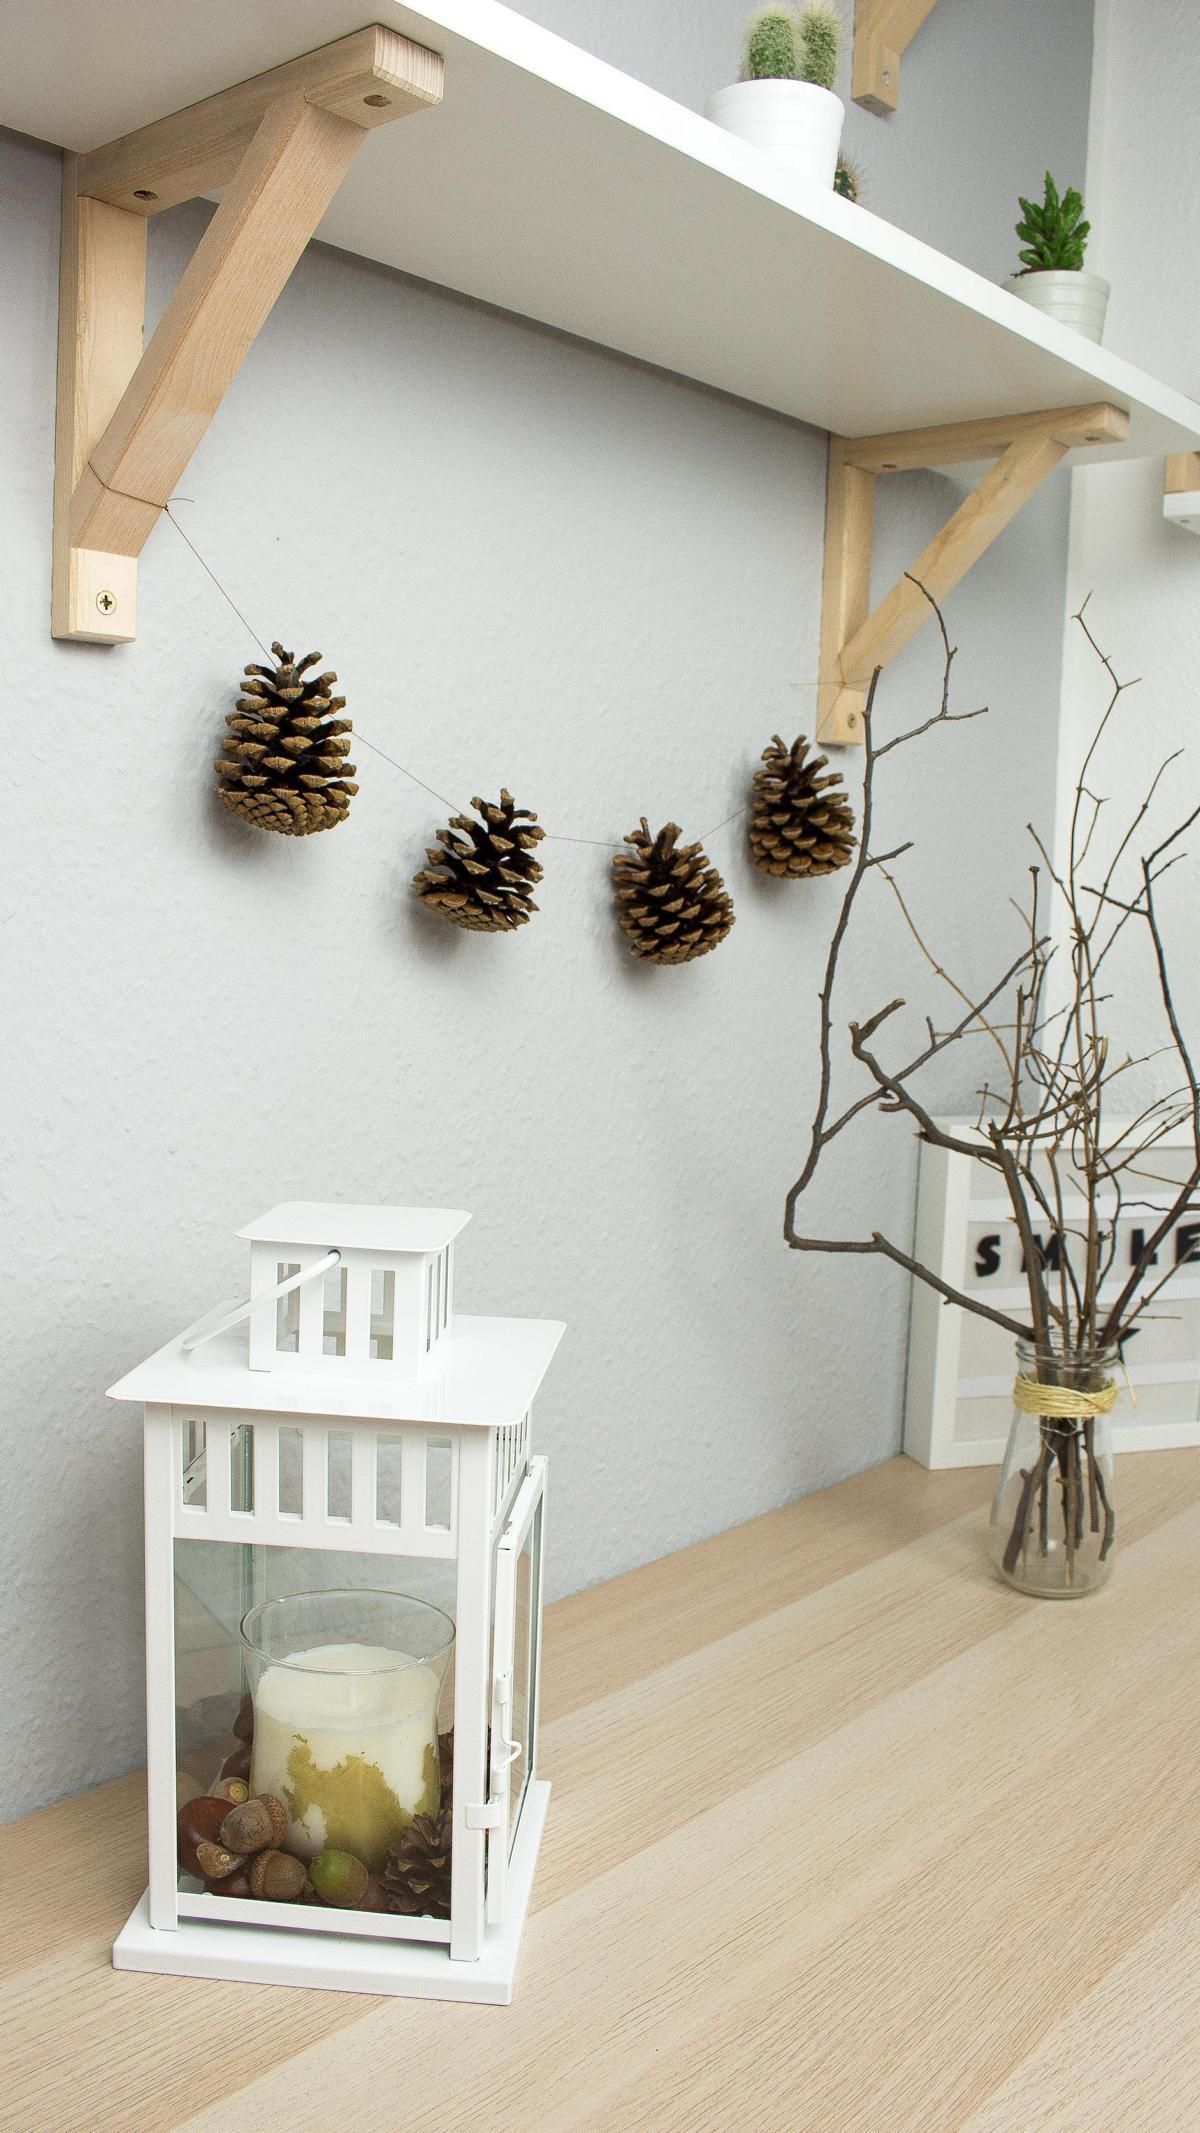 kuhle dekoration upcycling ideen zum selbermachen. Black Bedroom Furniture Sets. Home Design Ideas